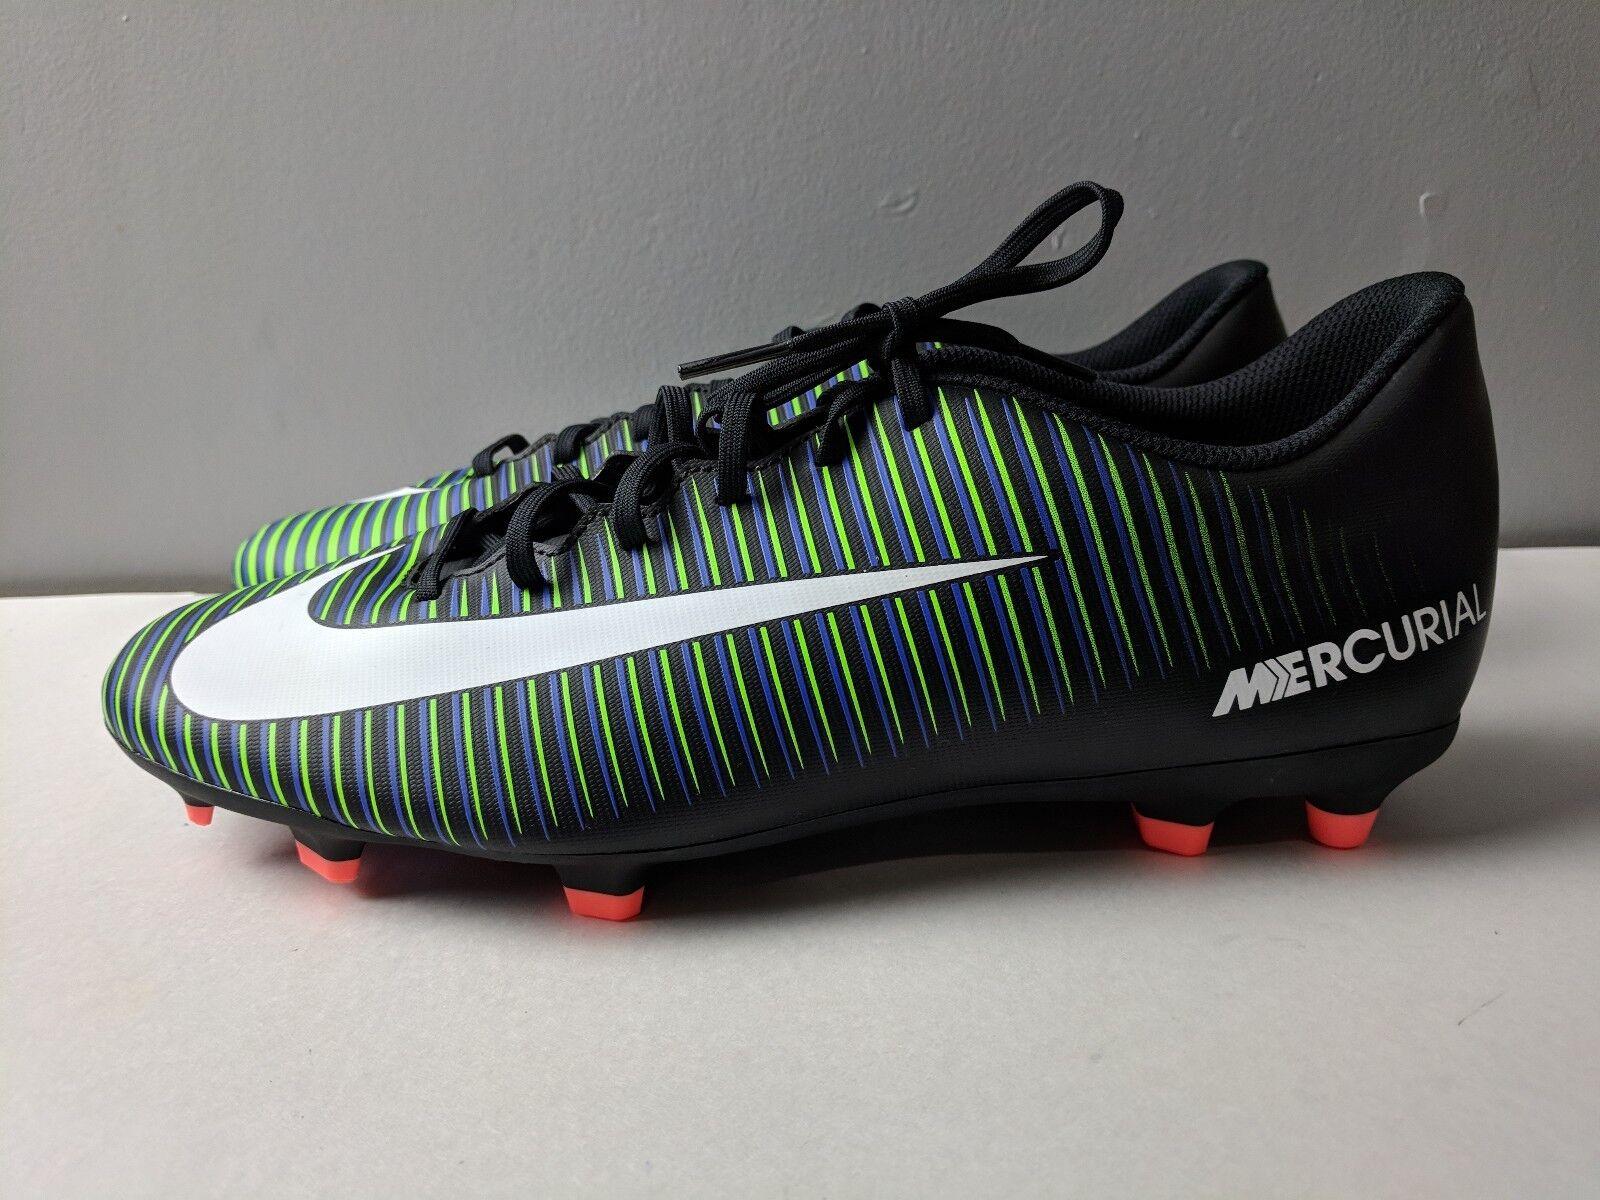 Nike Neon Dual Fusion St2 Womens Running Shoes Sz 7 Neon Nike Green/White Sneakers G-30 846cbc